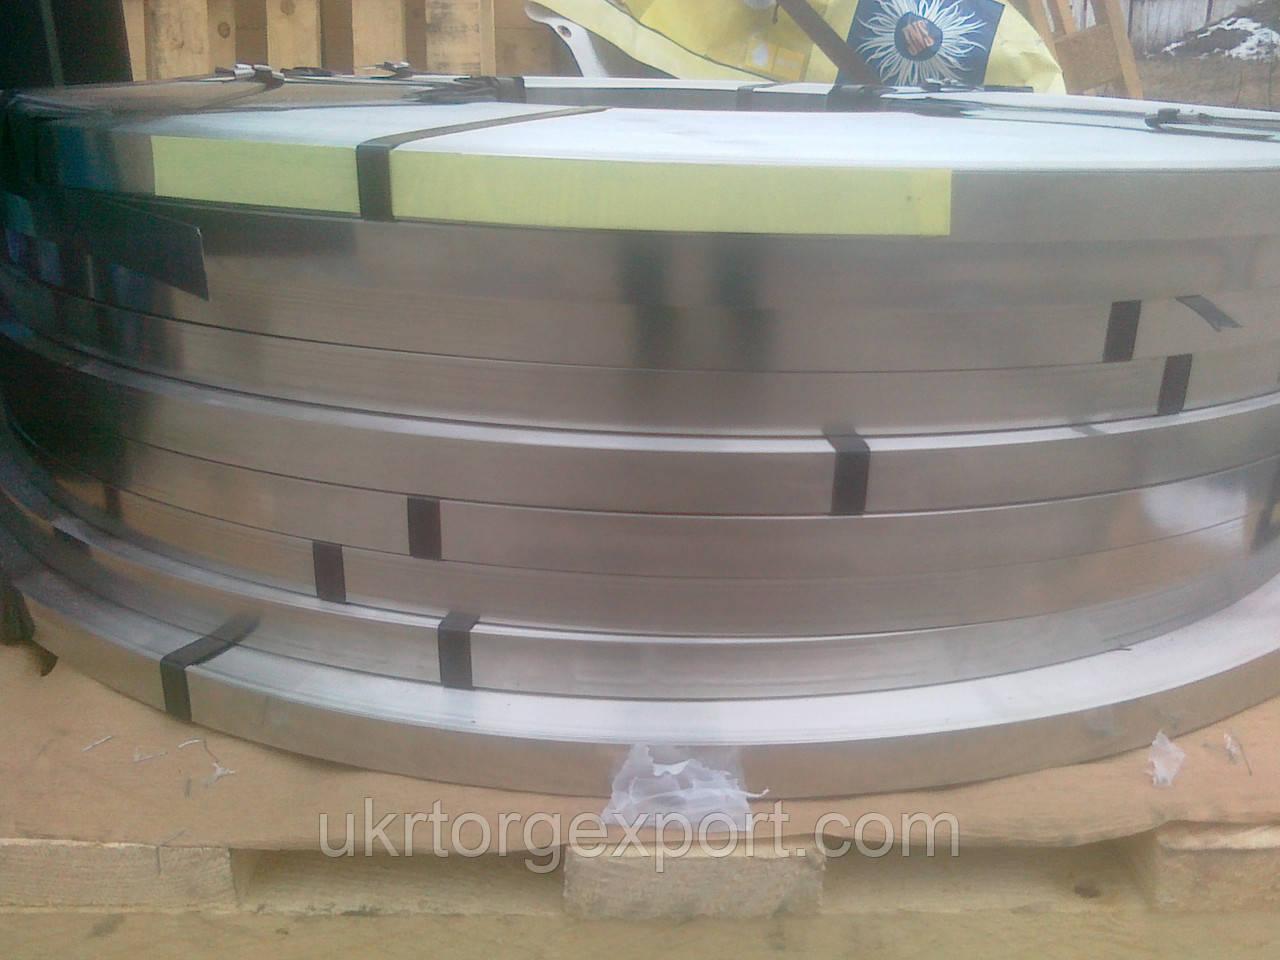 Лента фехраль Х23Ю5Т (OCr23Al5) 0,1*0,5 мм